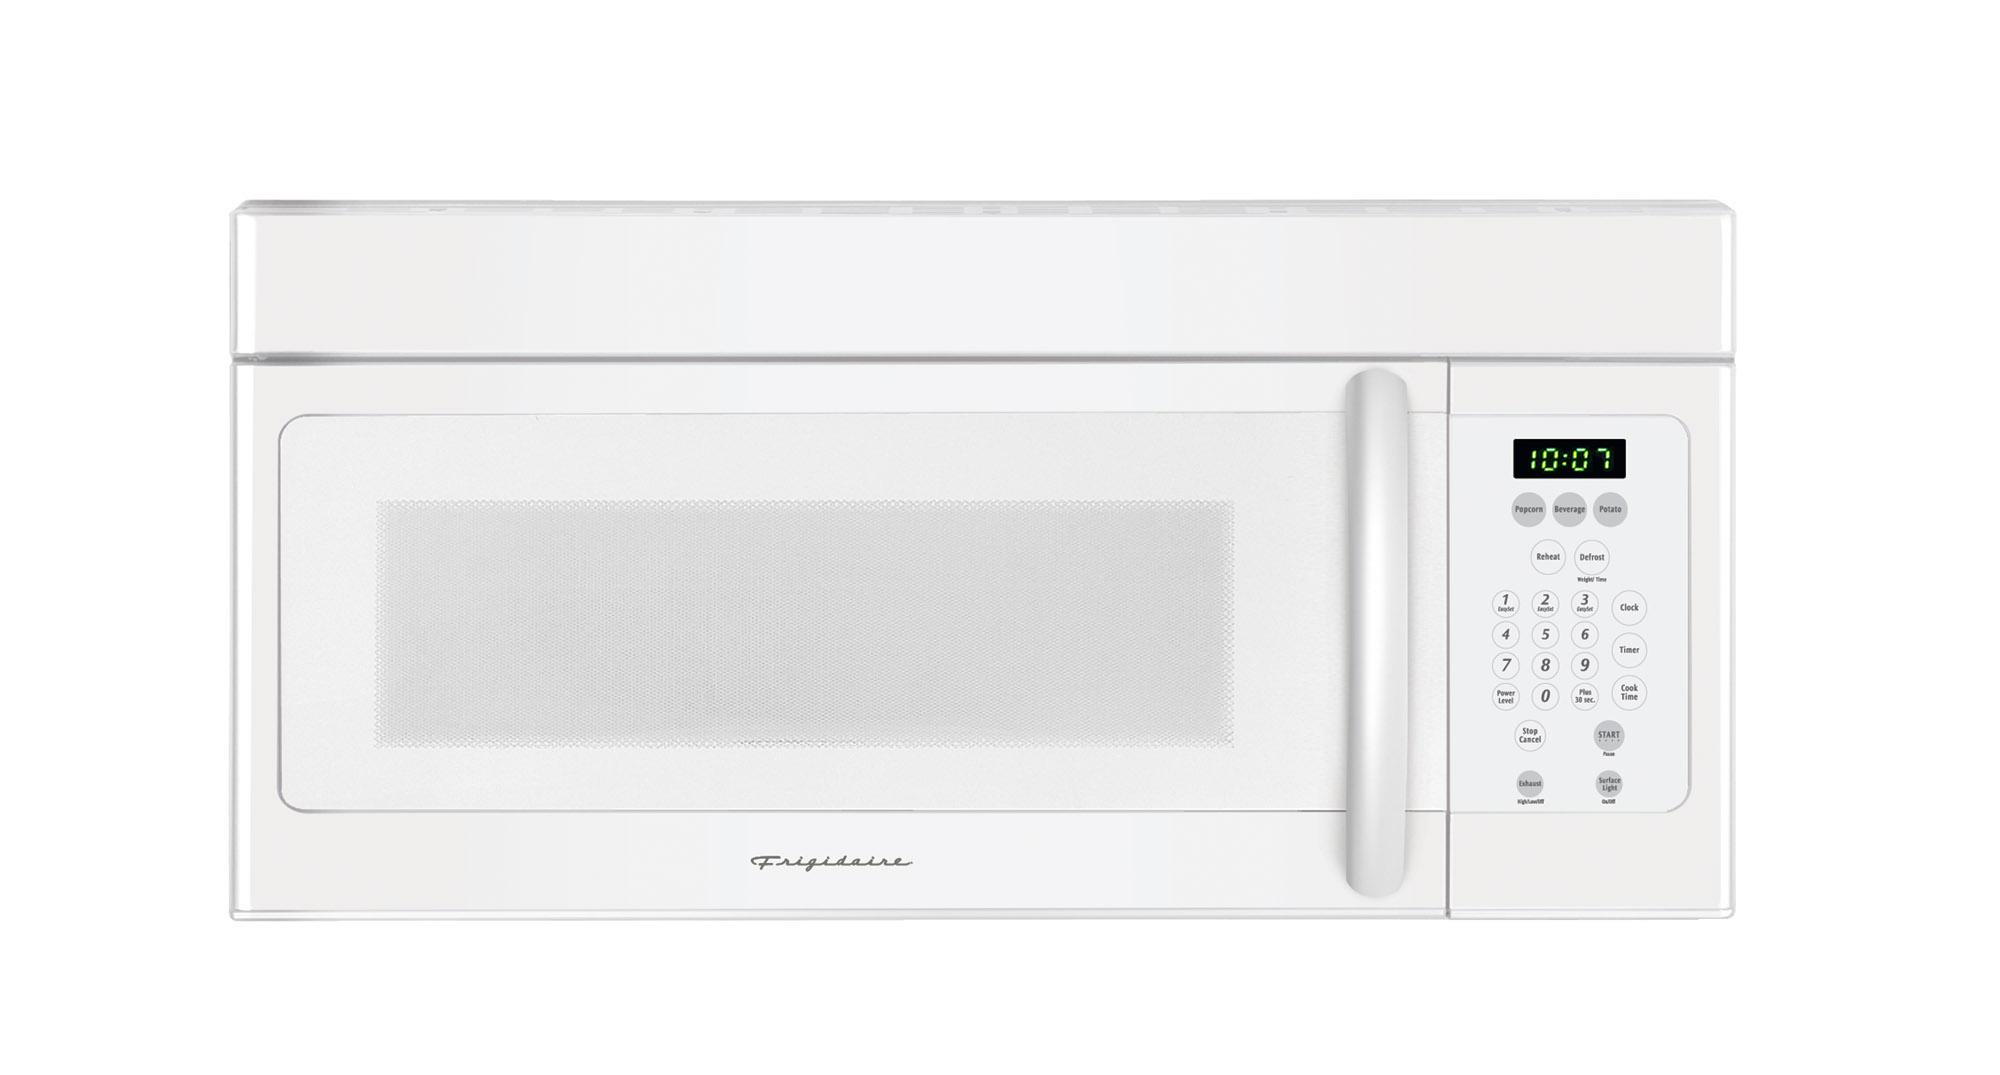 Frigidaire Microwave Model FMV152KWA Parts